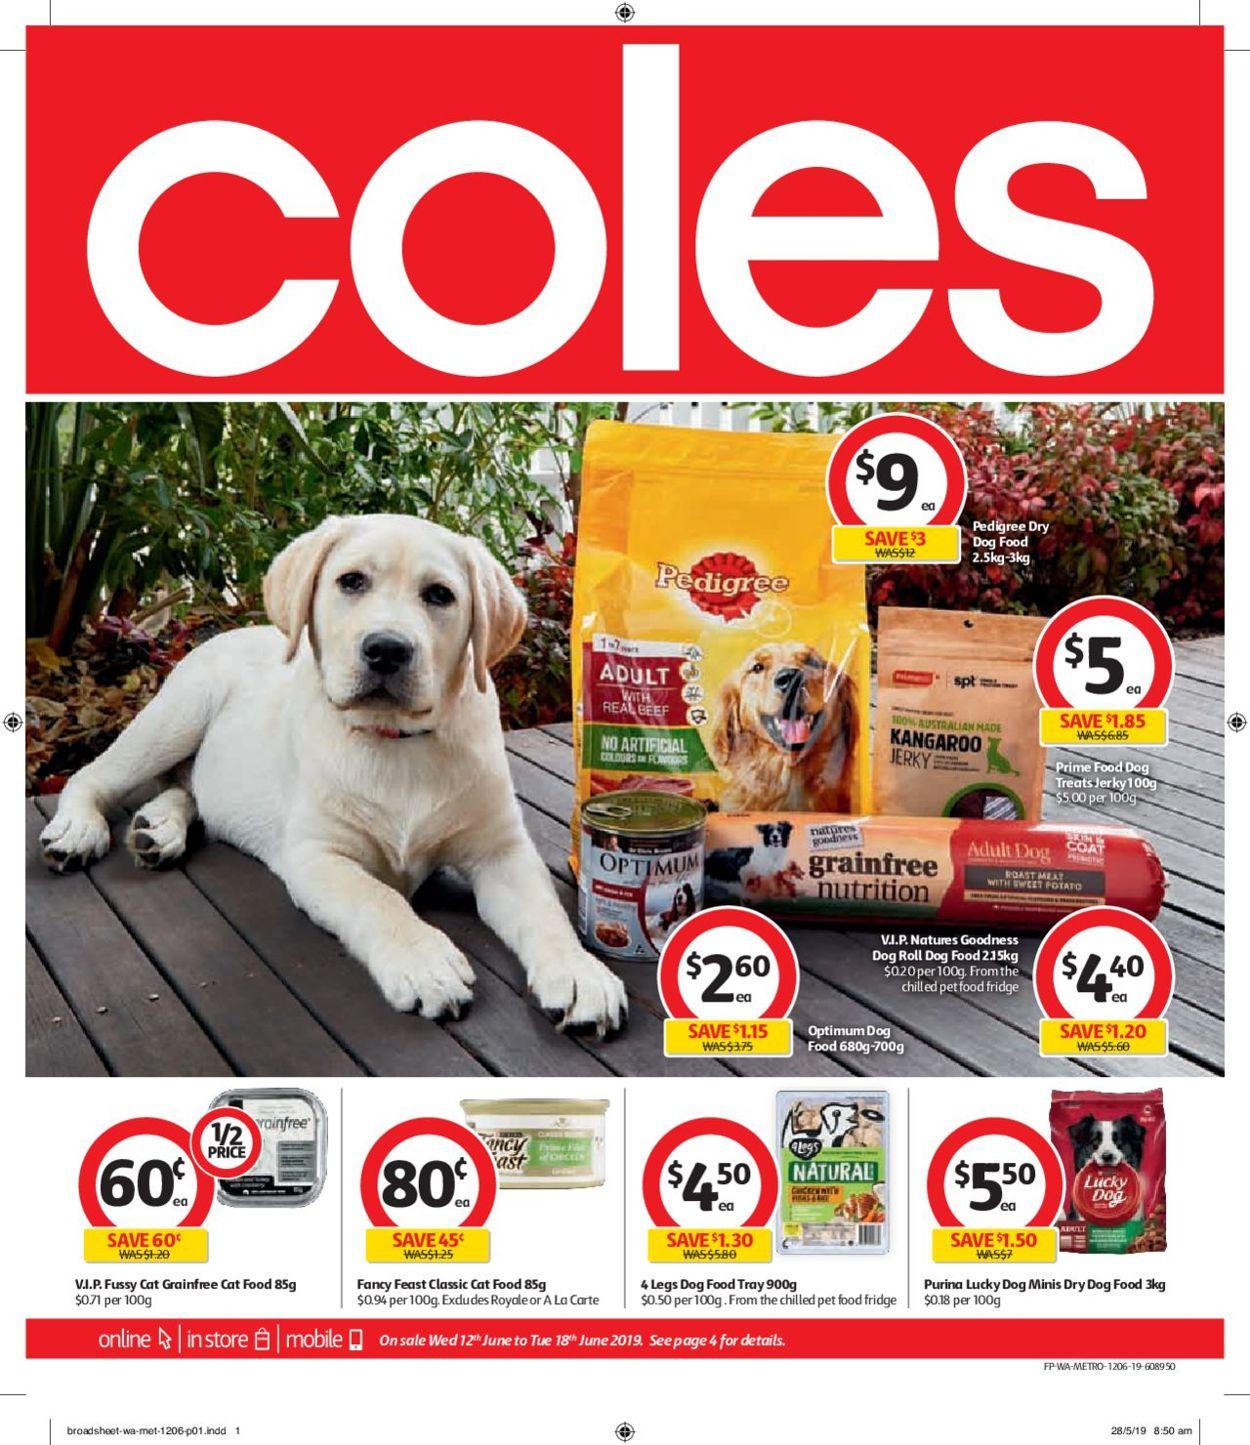 Coles Catalogue - 12/06-18/06/2019